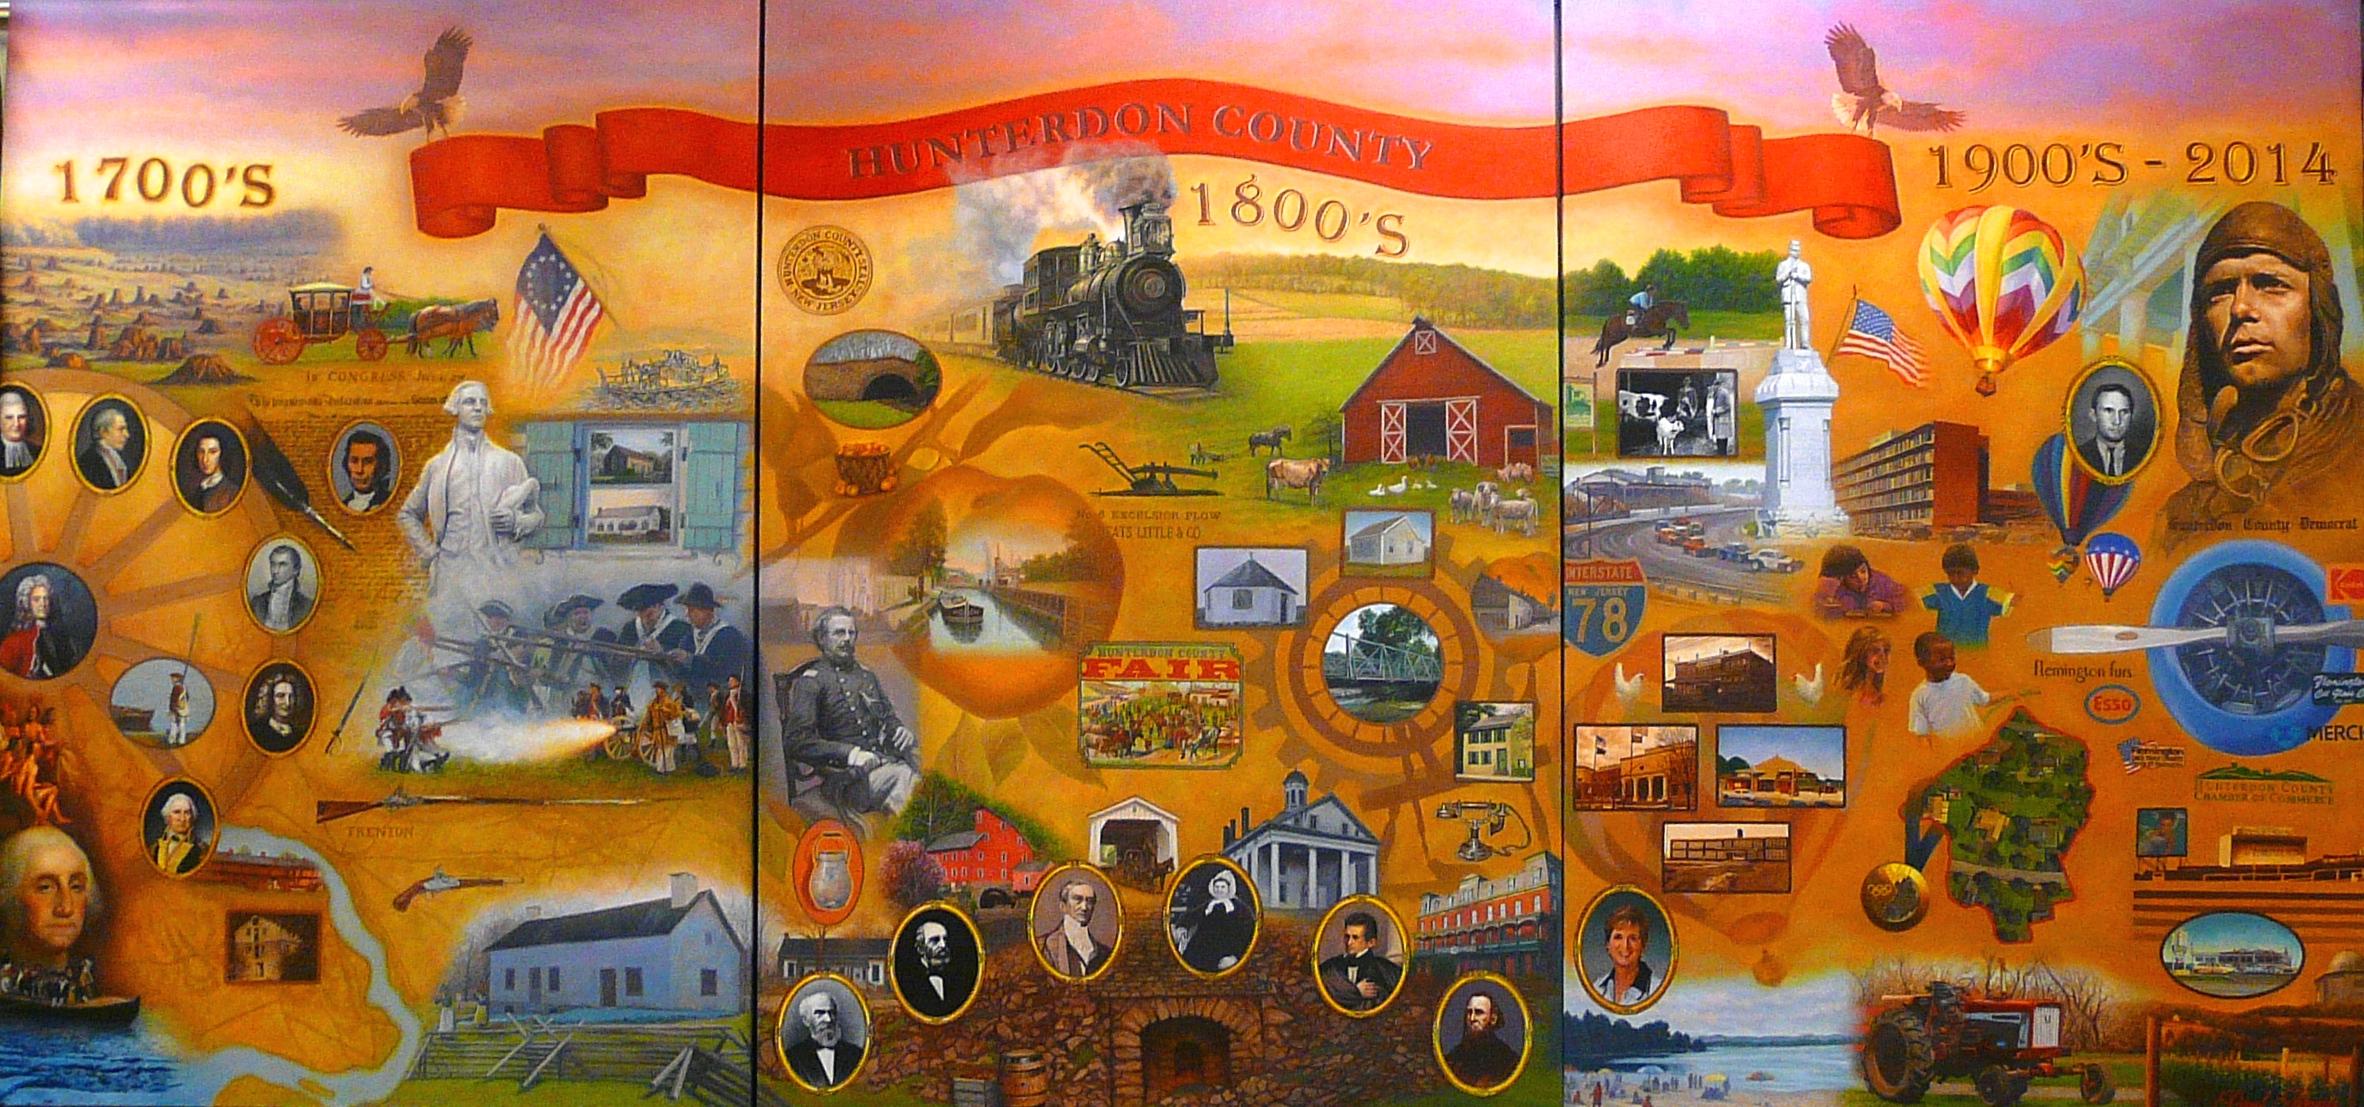 Hunterdon county tricentennial celebration